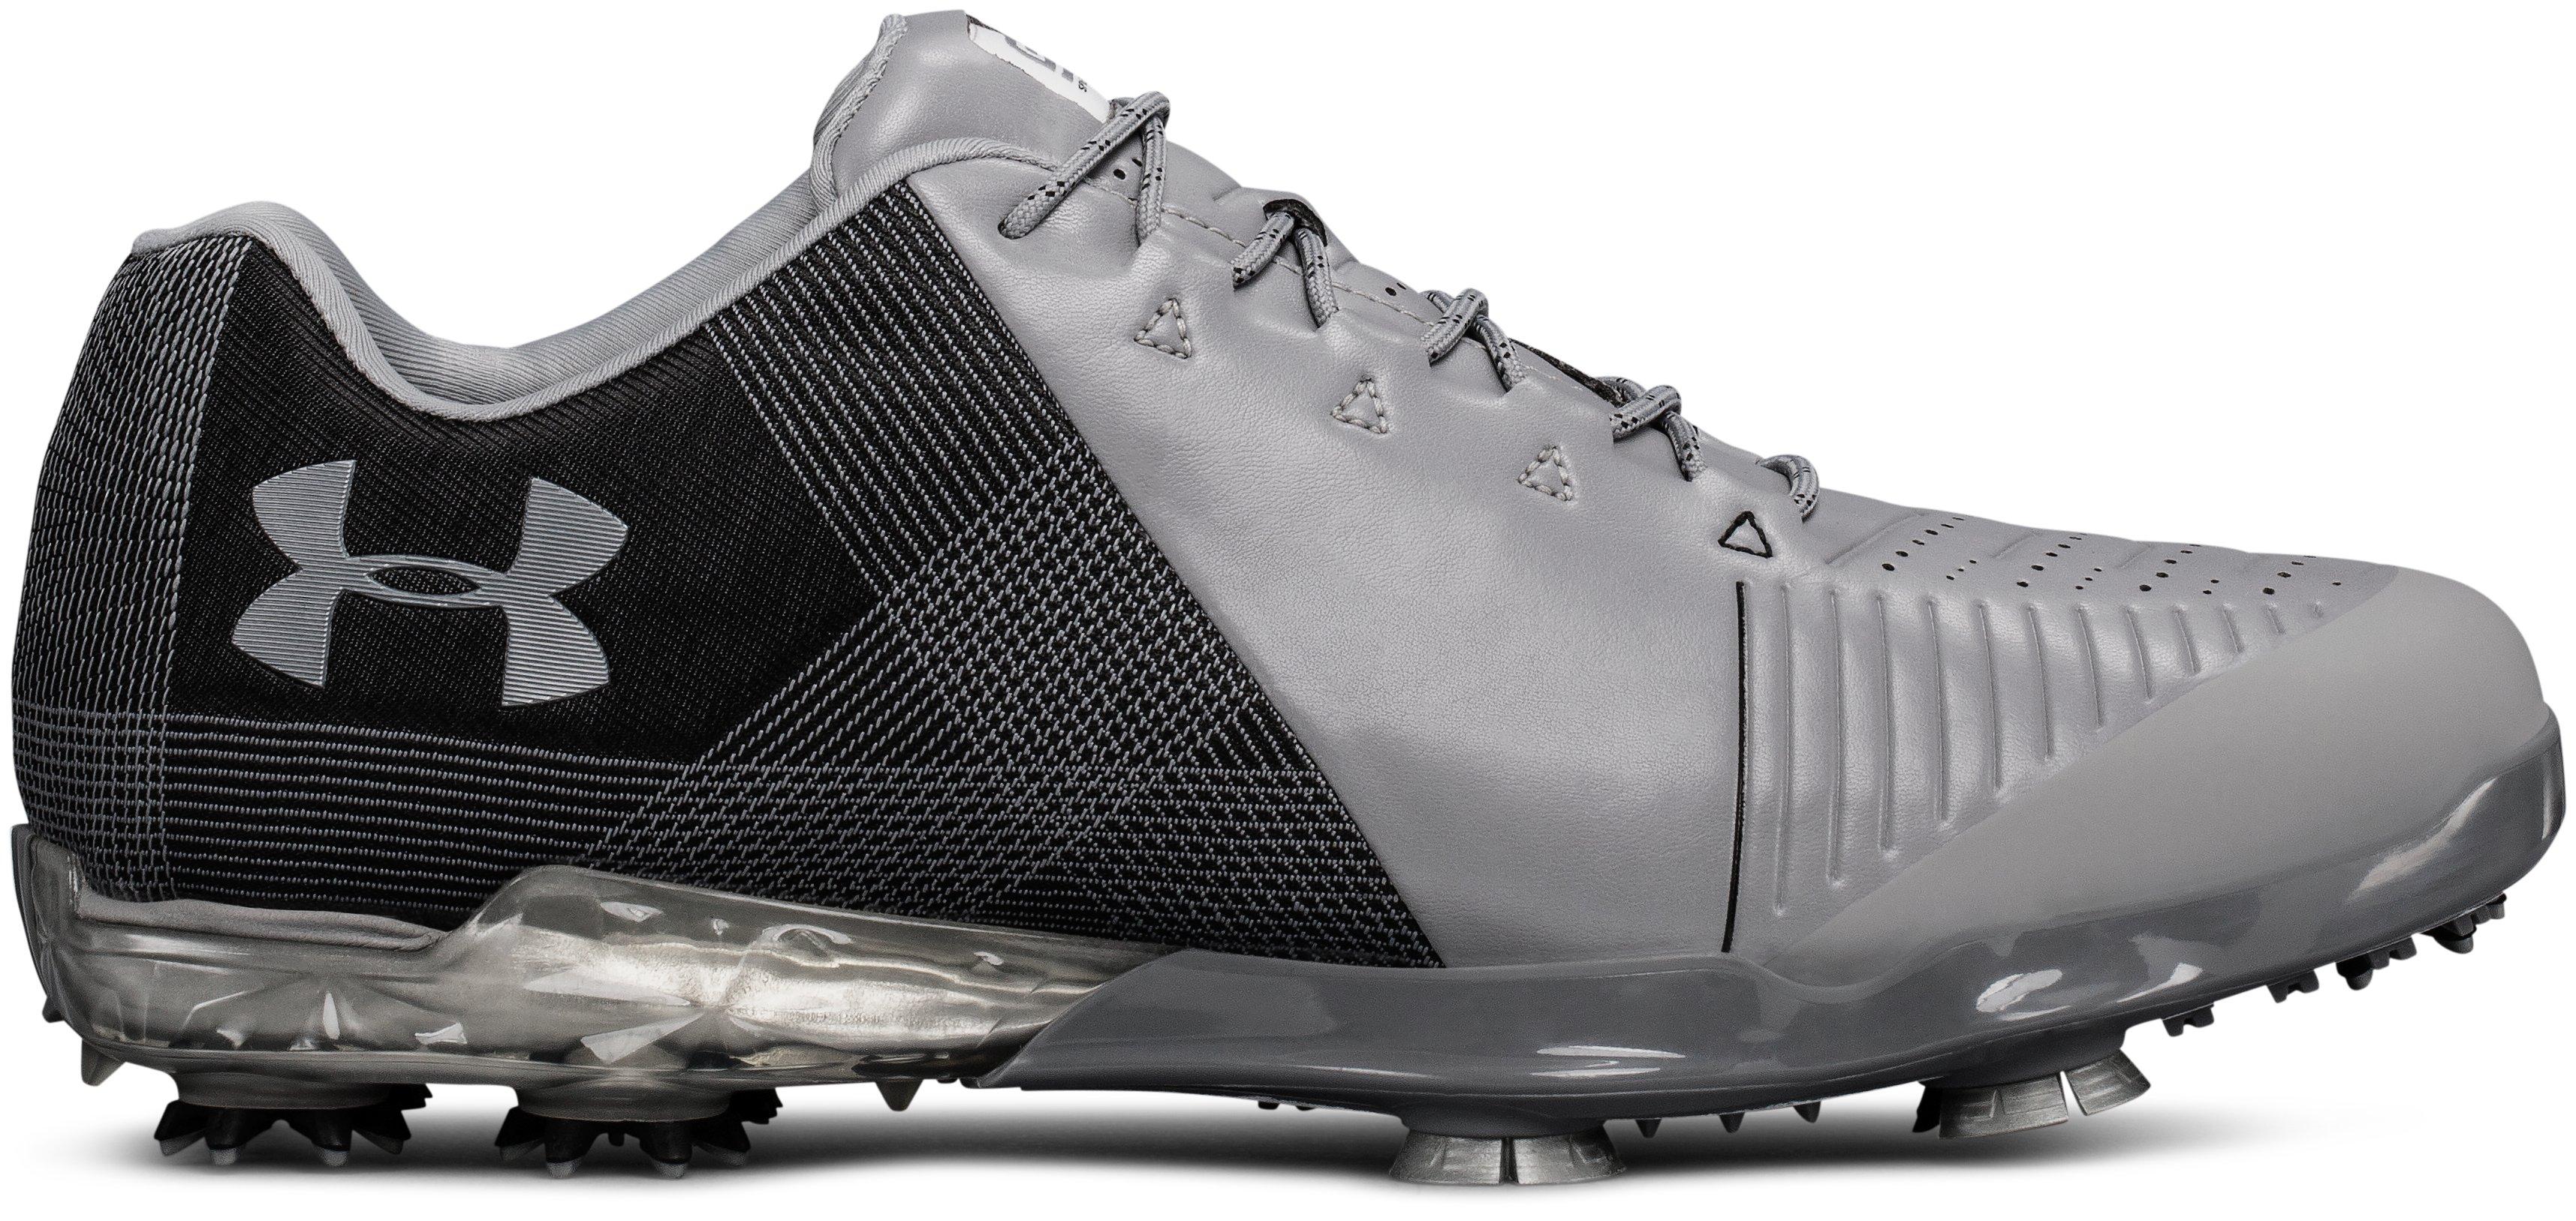 Men's UA Spieth 2 Golf Shoes, 360 degree view